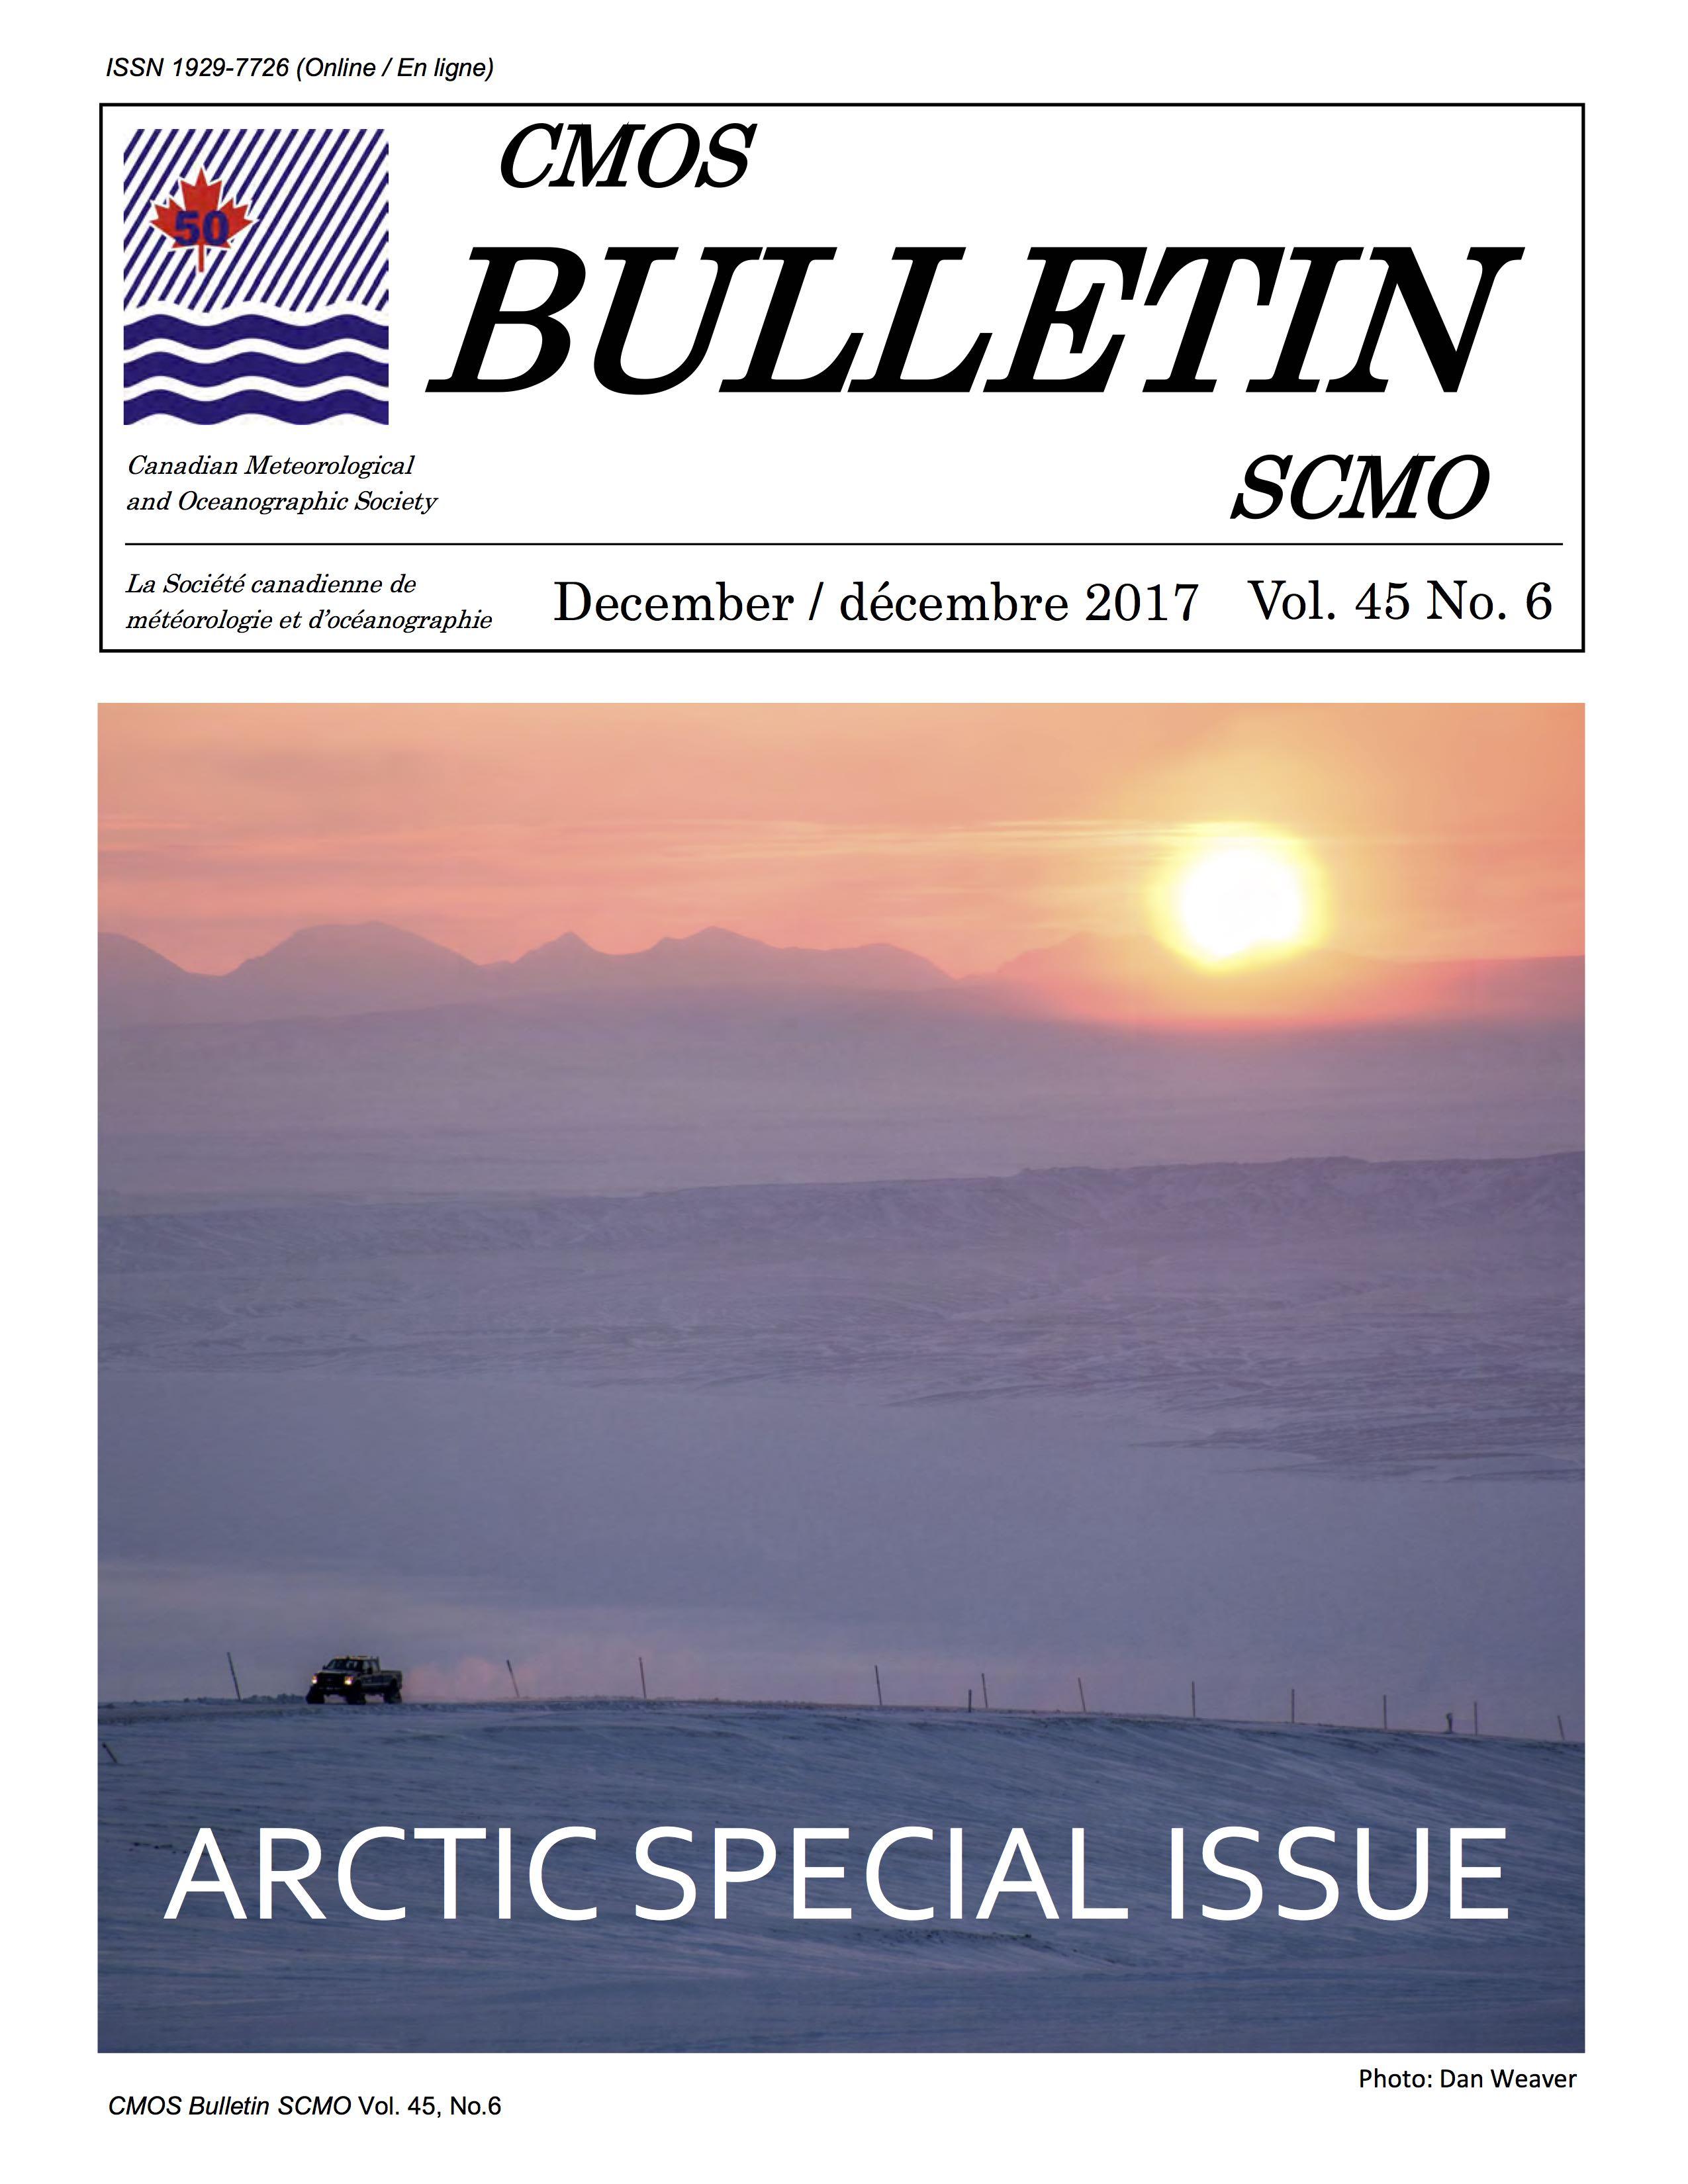 CMOS Bulletin cover (Dec. 2017)